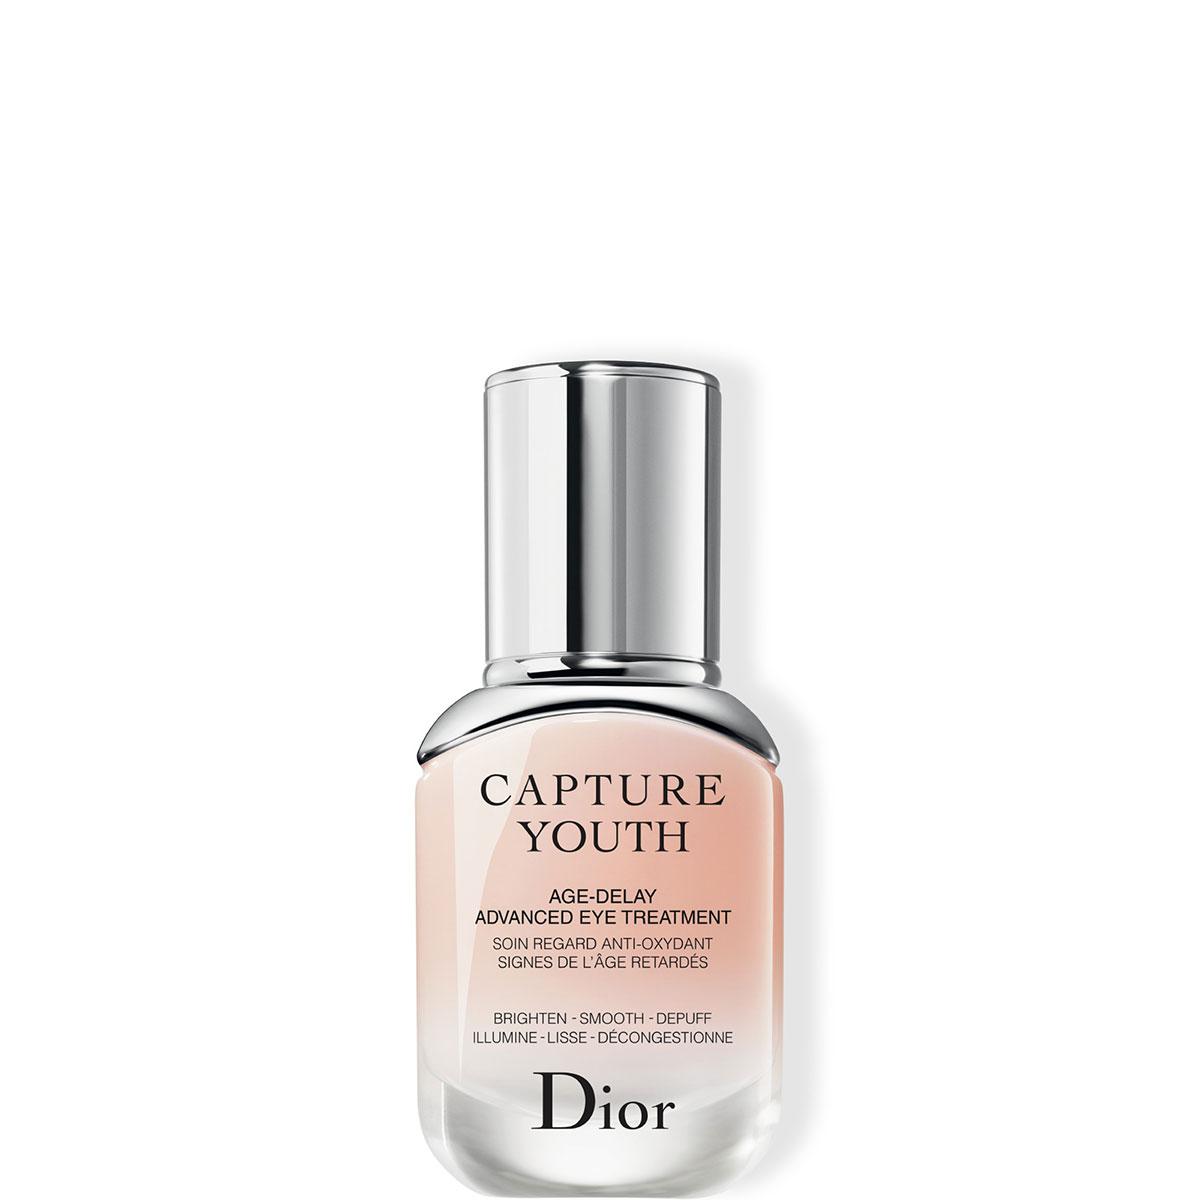 Dior - Capture Youth - Soin regard antioxydant